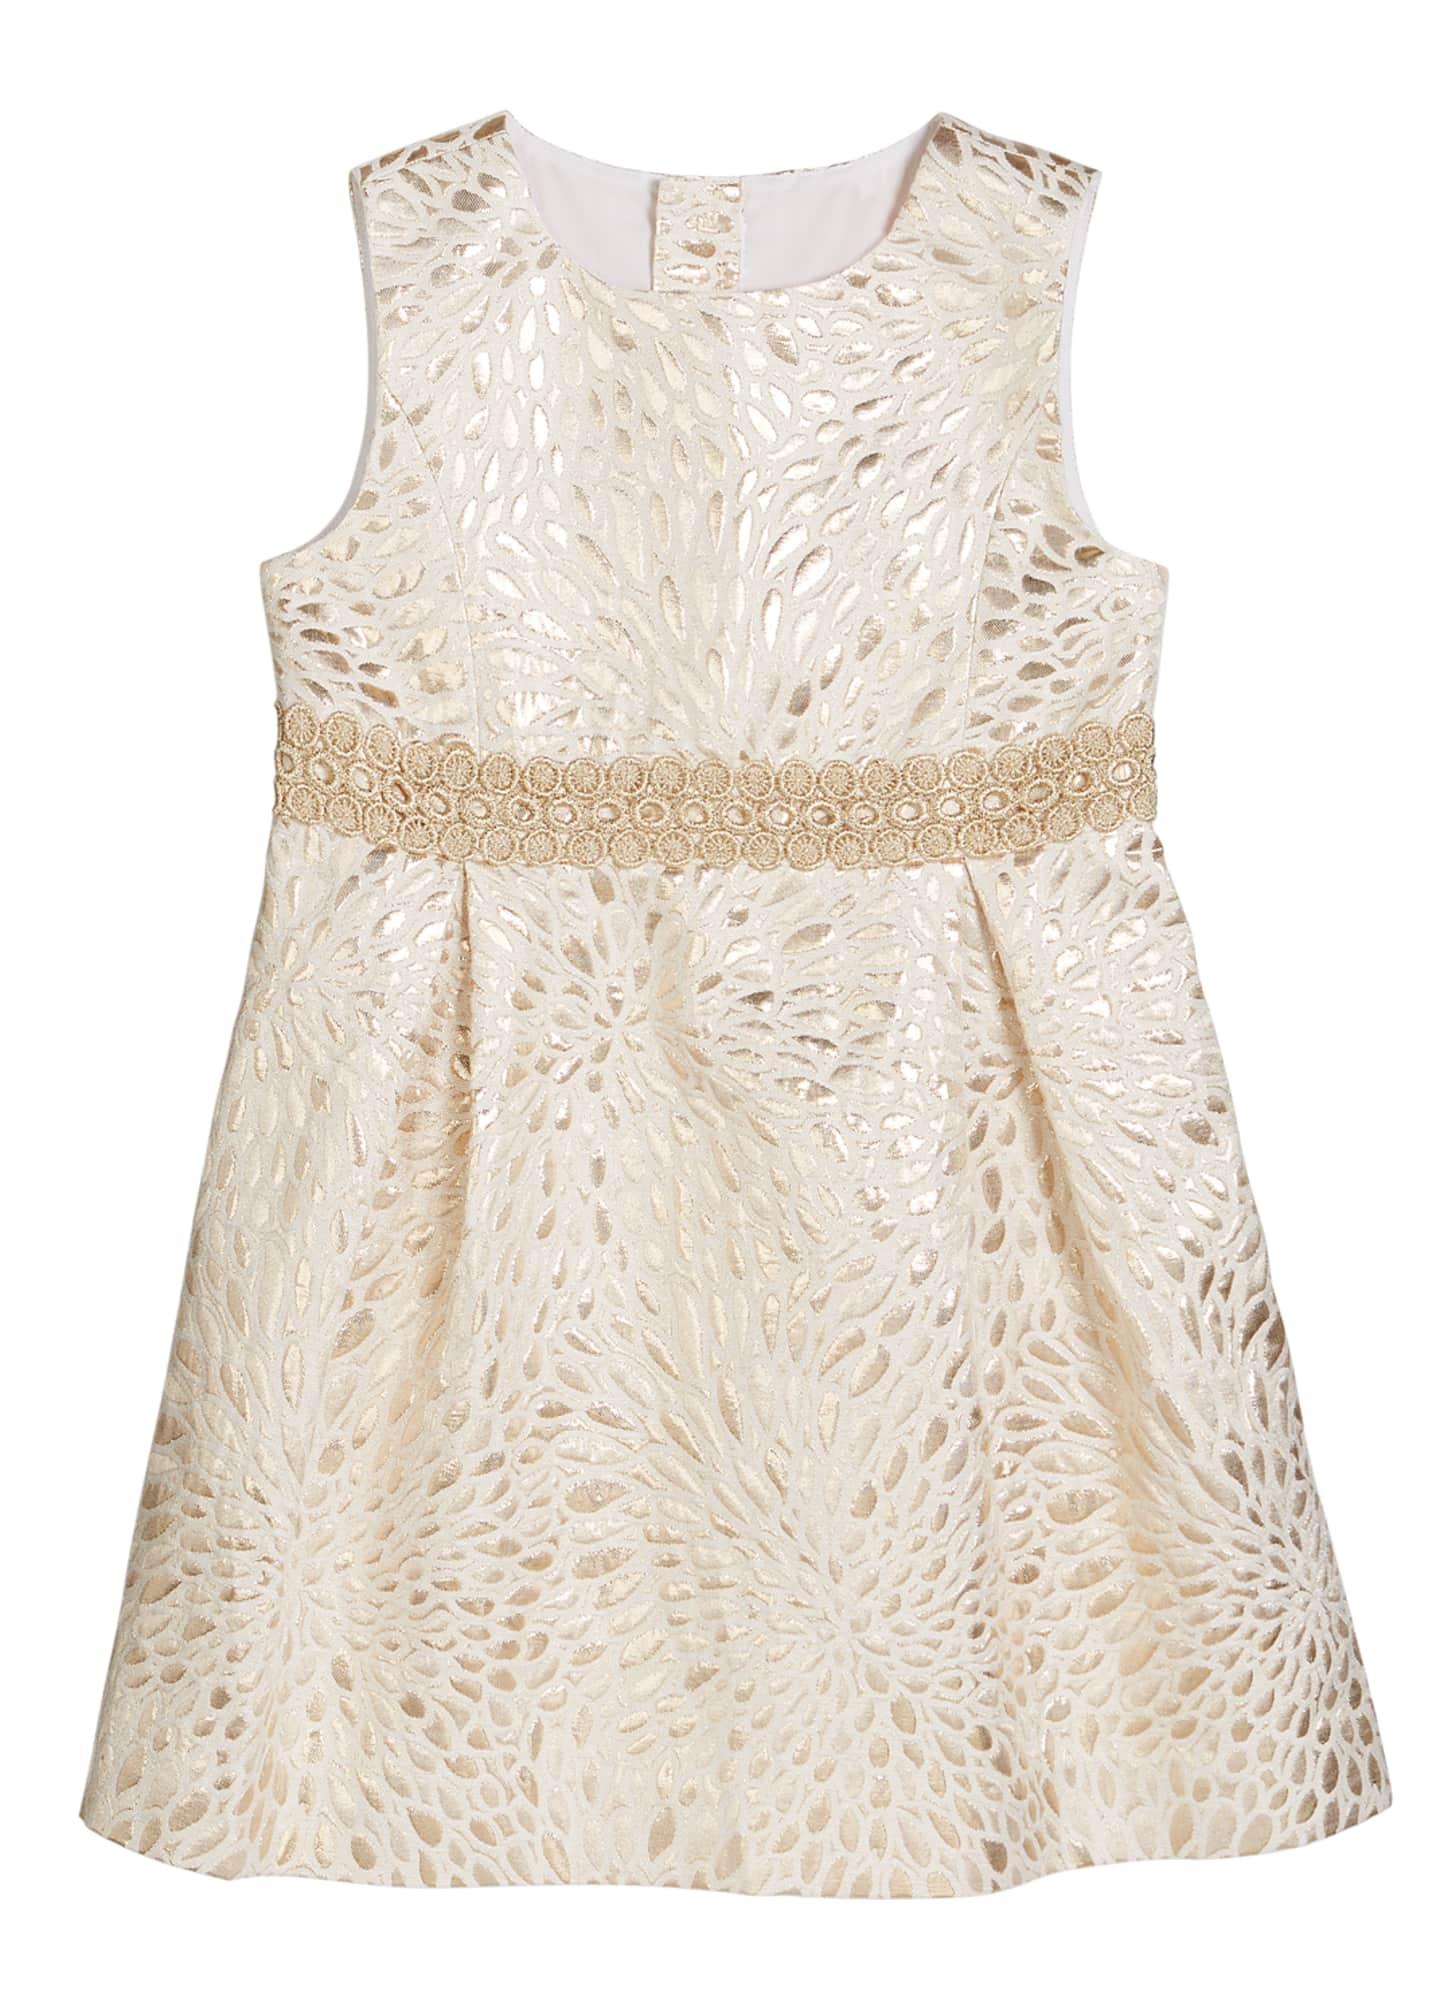 Lilly Pulitzer Girl's Abrianna Metallic Jacquard Dress, Size